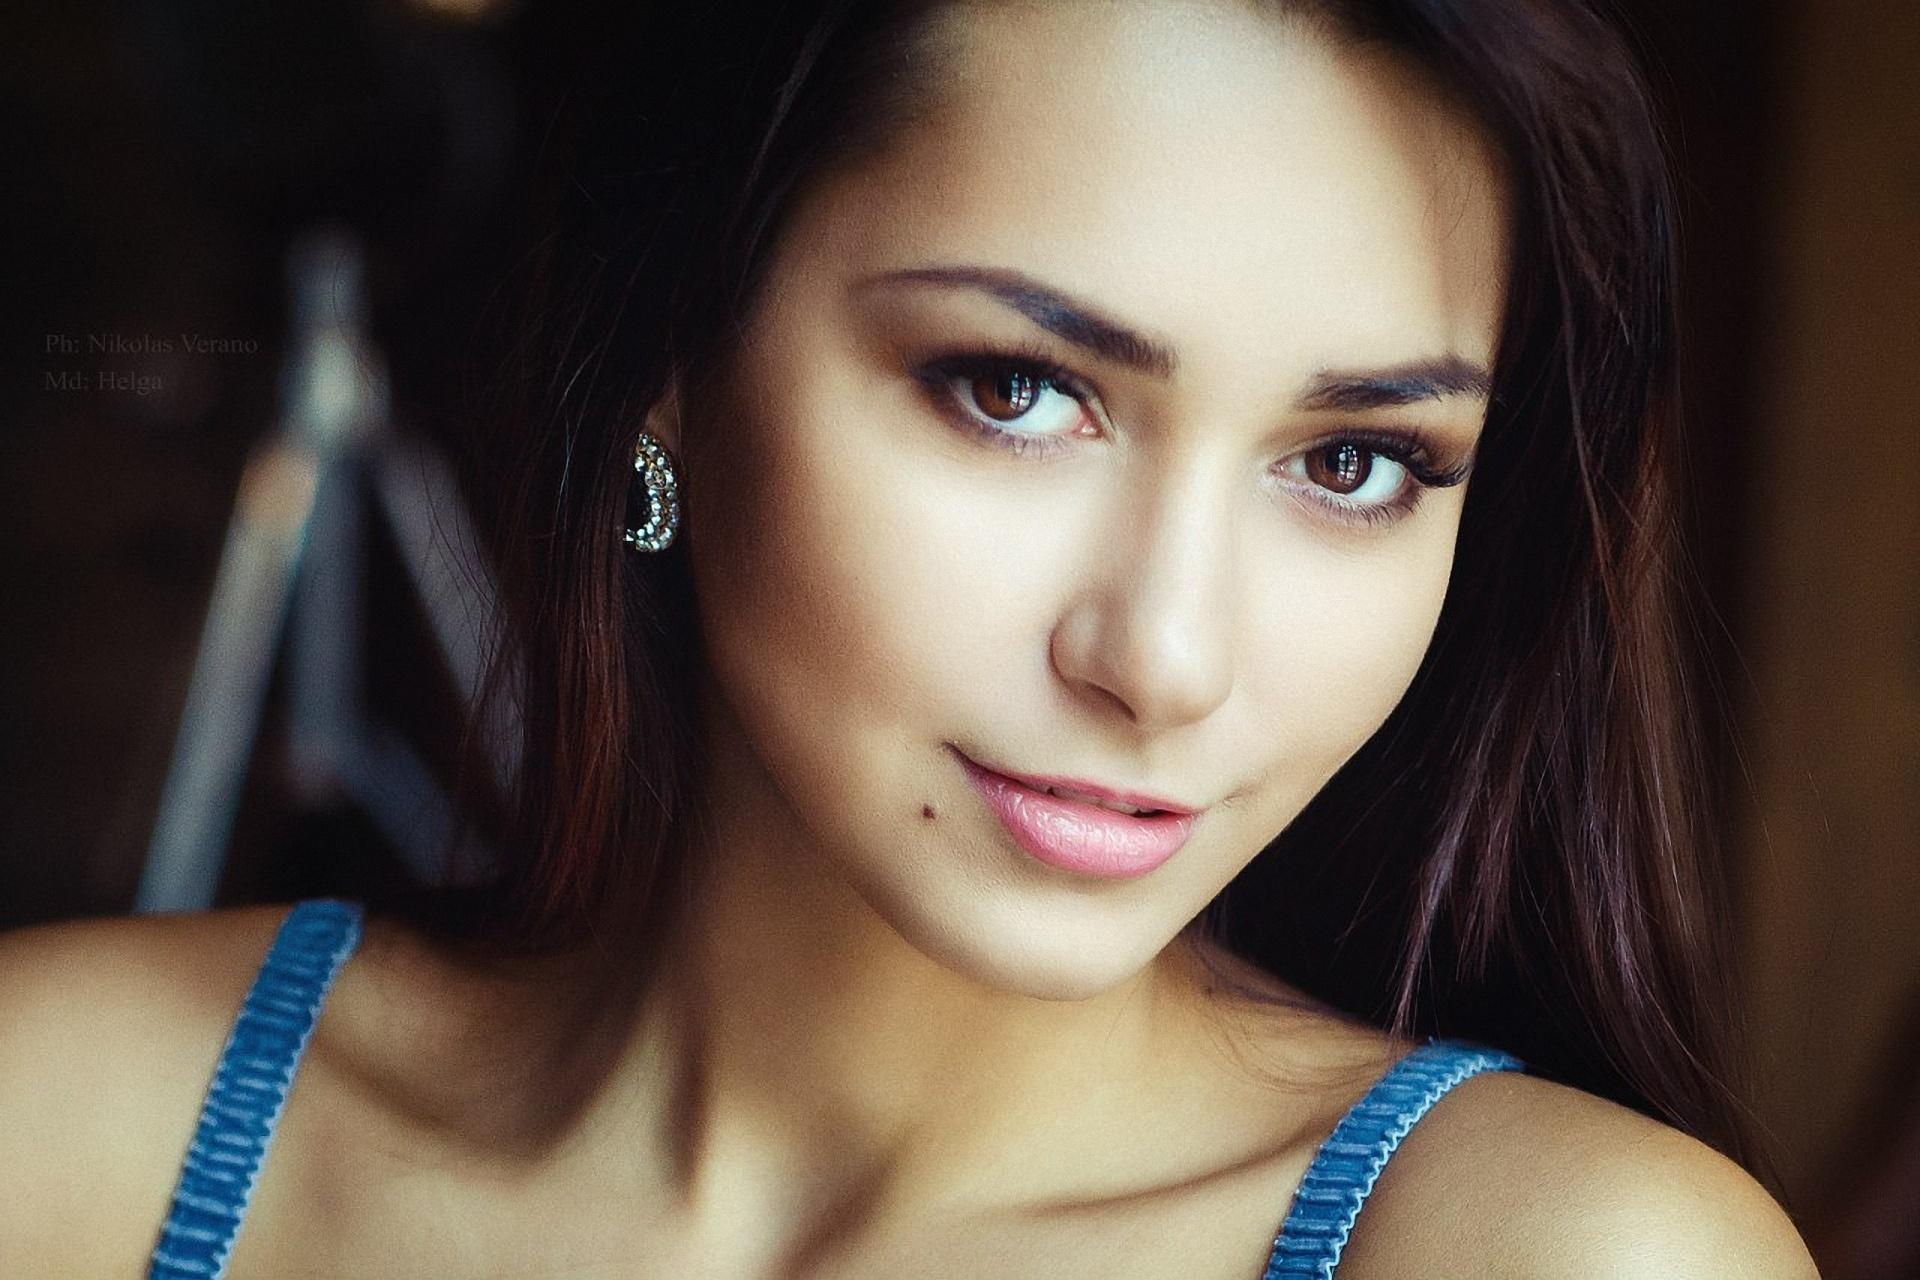 Картинки девушка, модель, позирует, helga lovekaty - обои